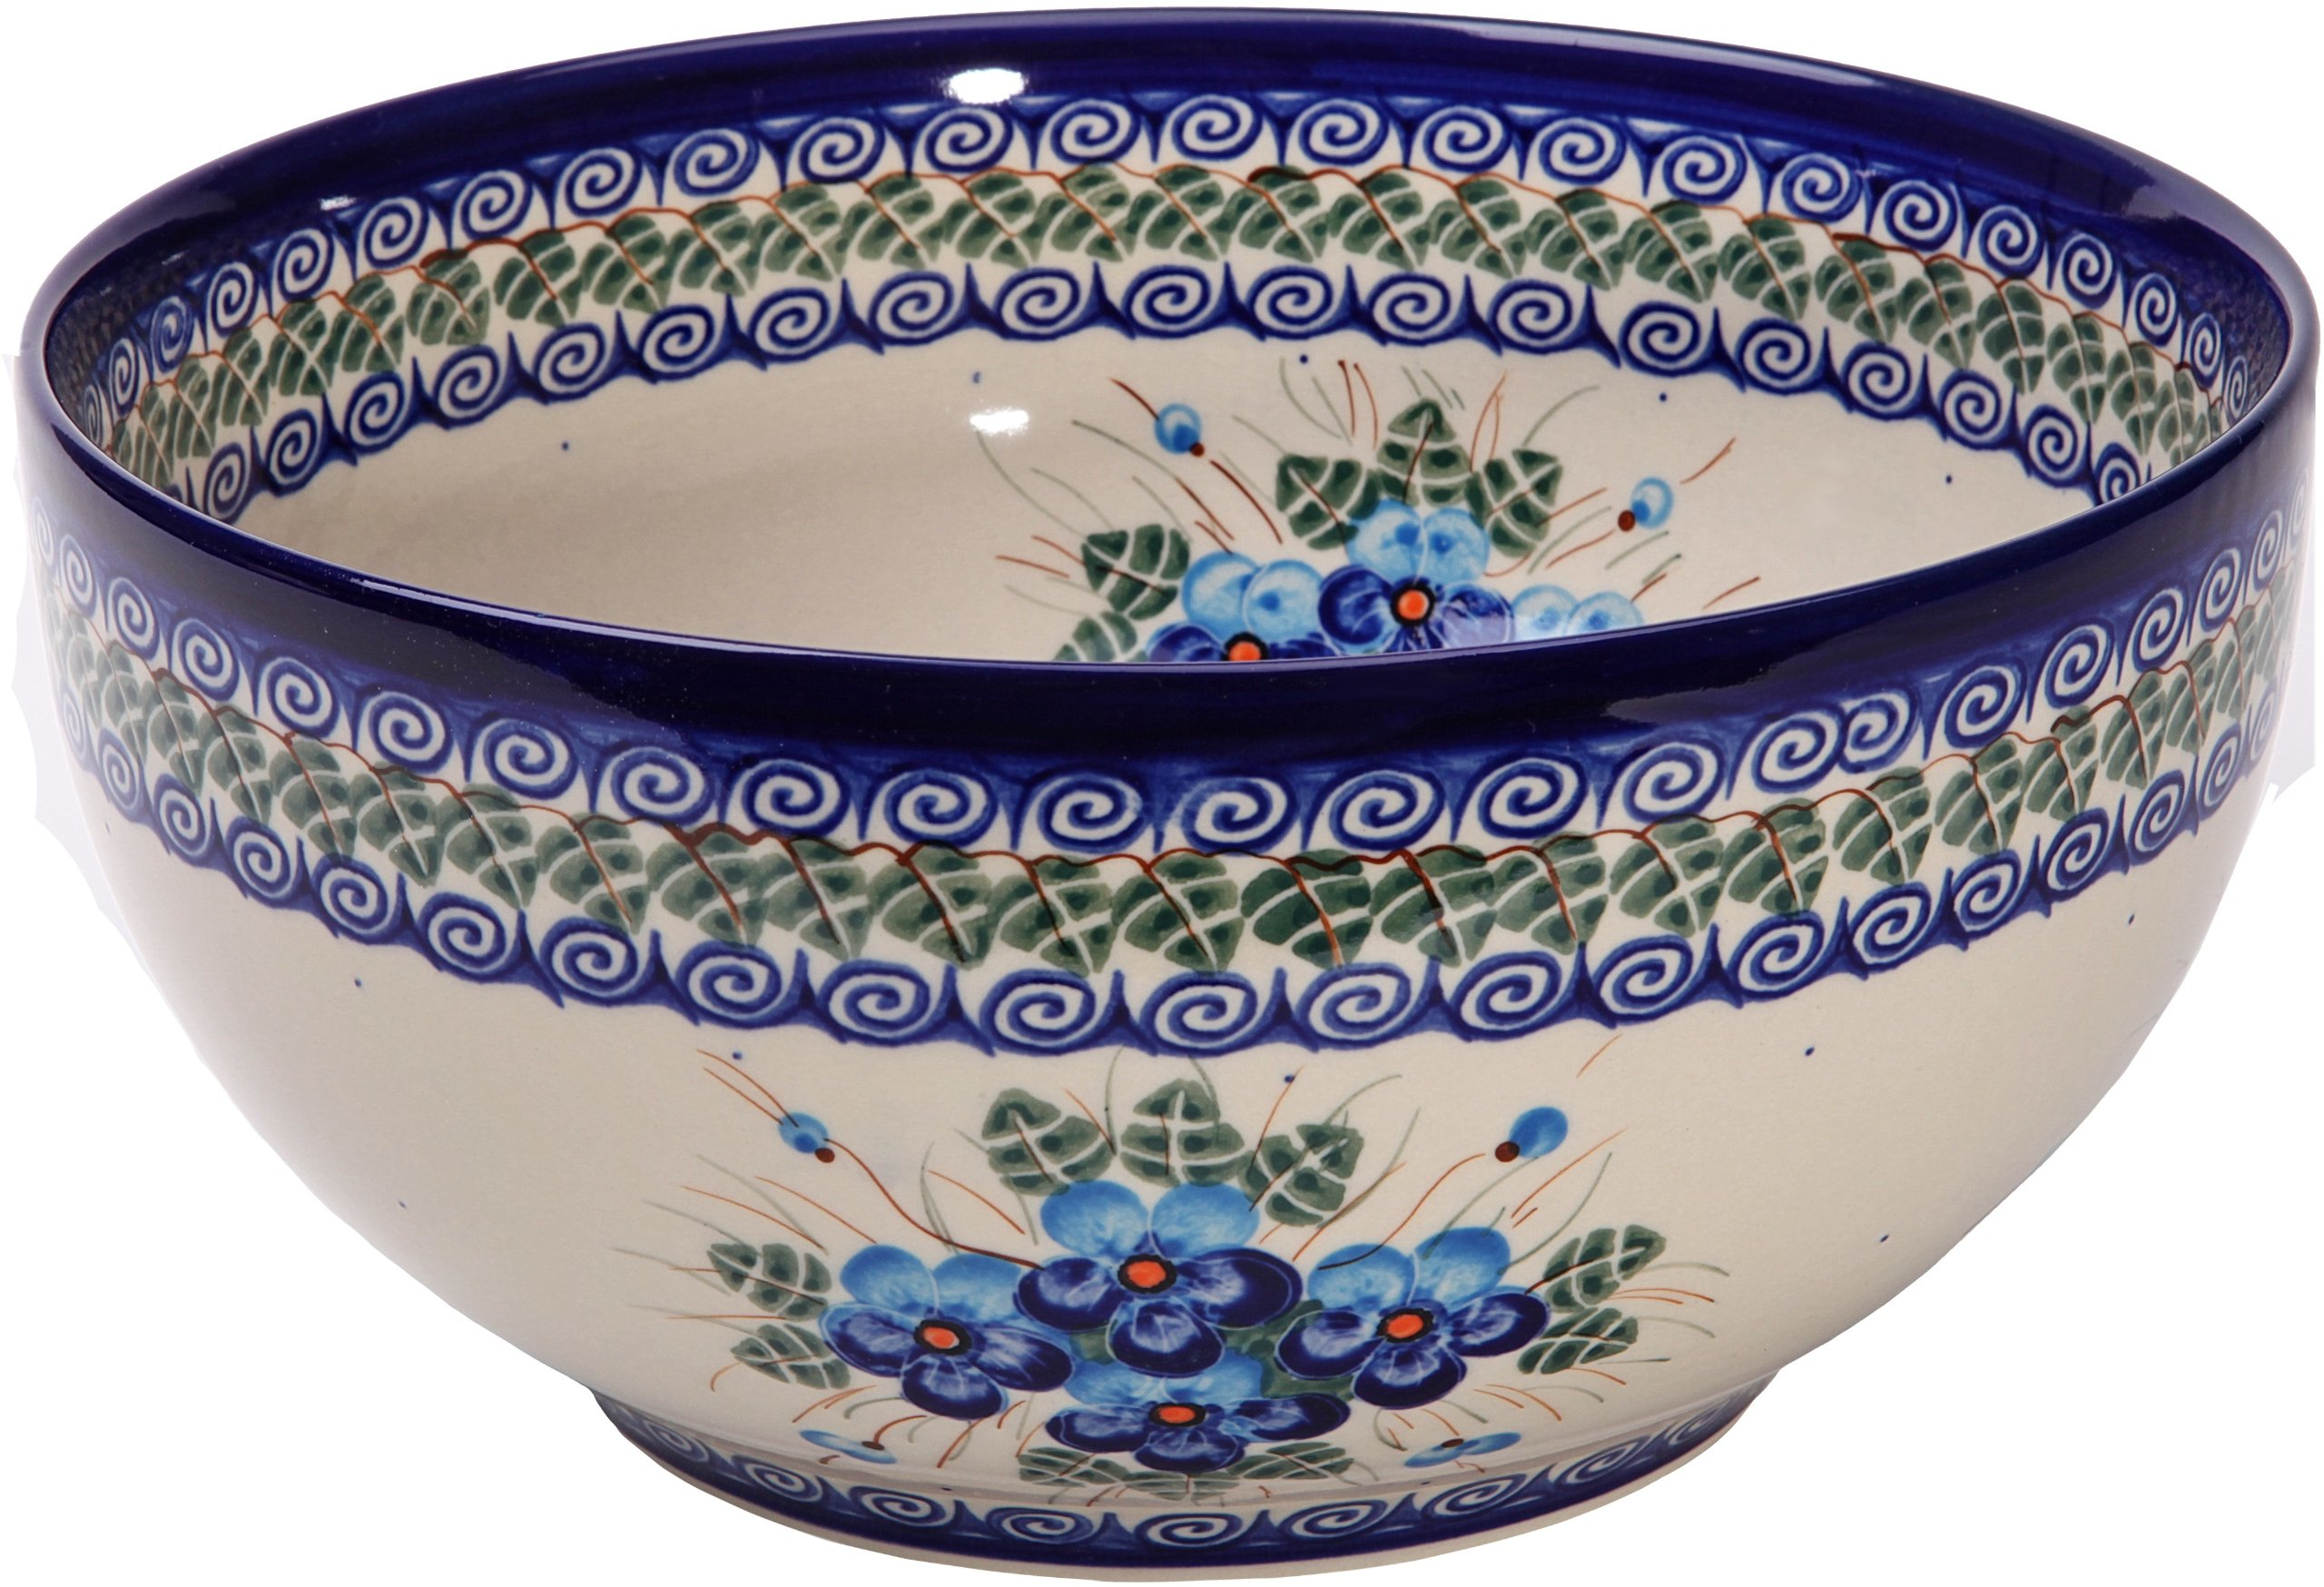 Polish Pottery Ceramika Boleslawiec,  0411/162, Bowl 23, 10 Cups, Royal Blue Patterns with Blue Pansy Flower Motif